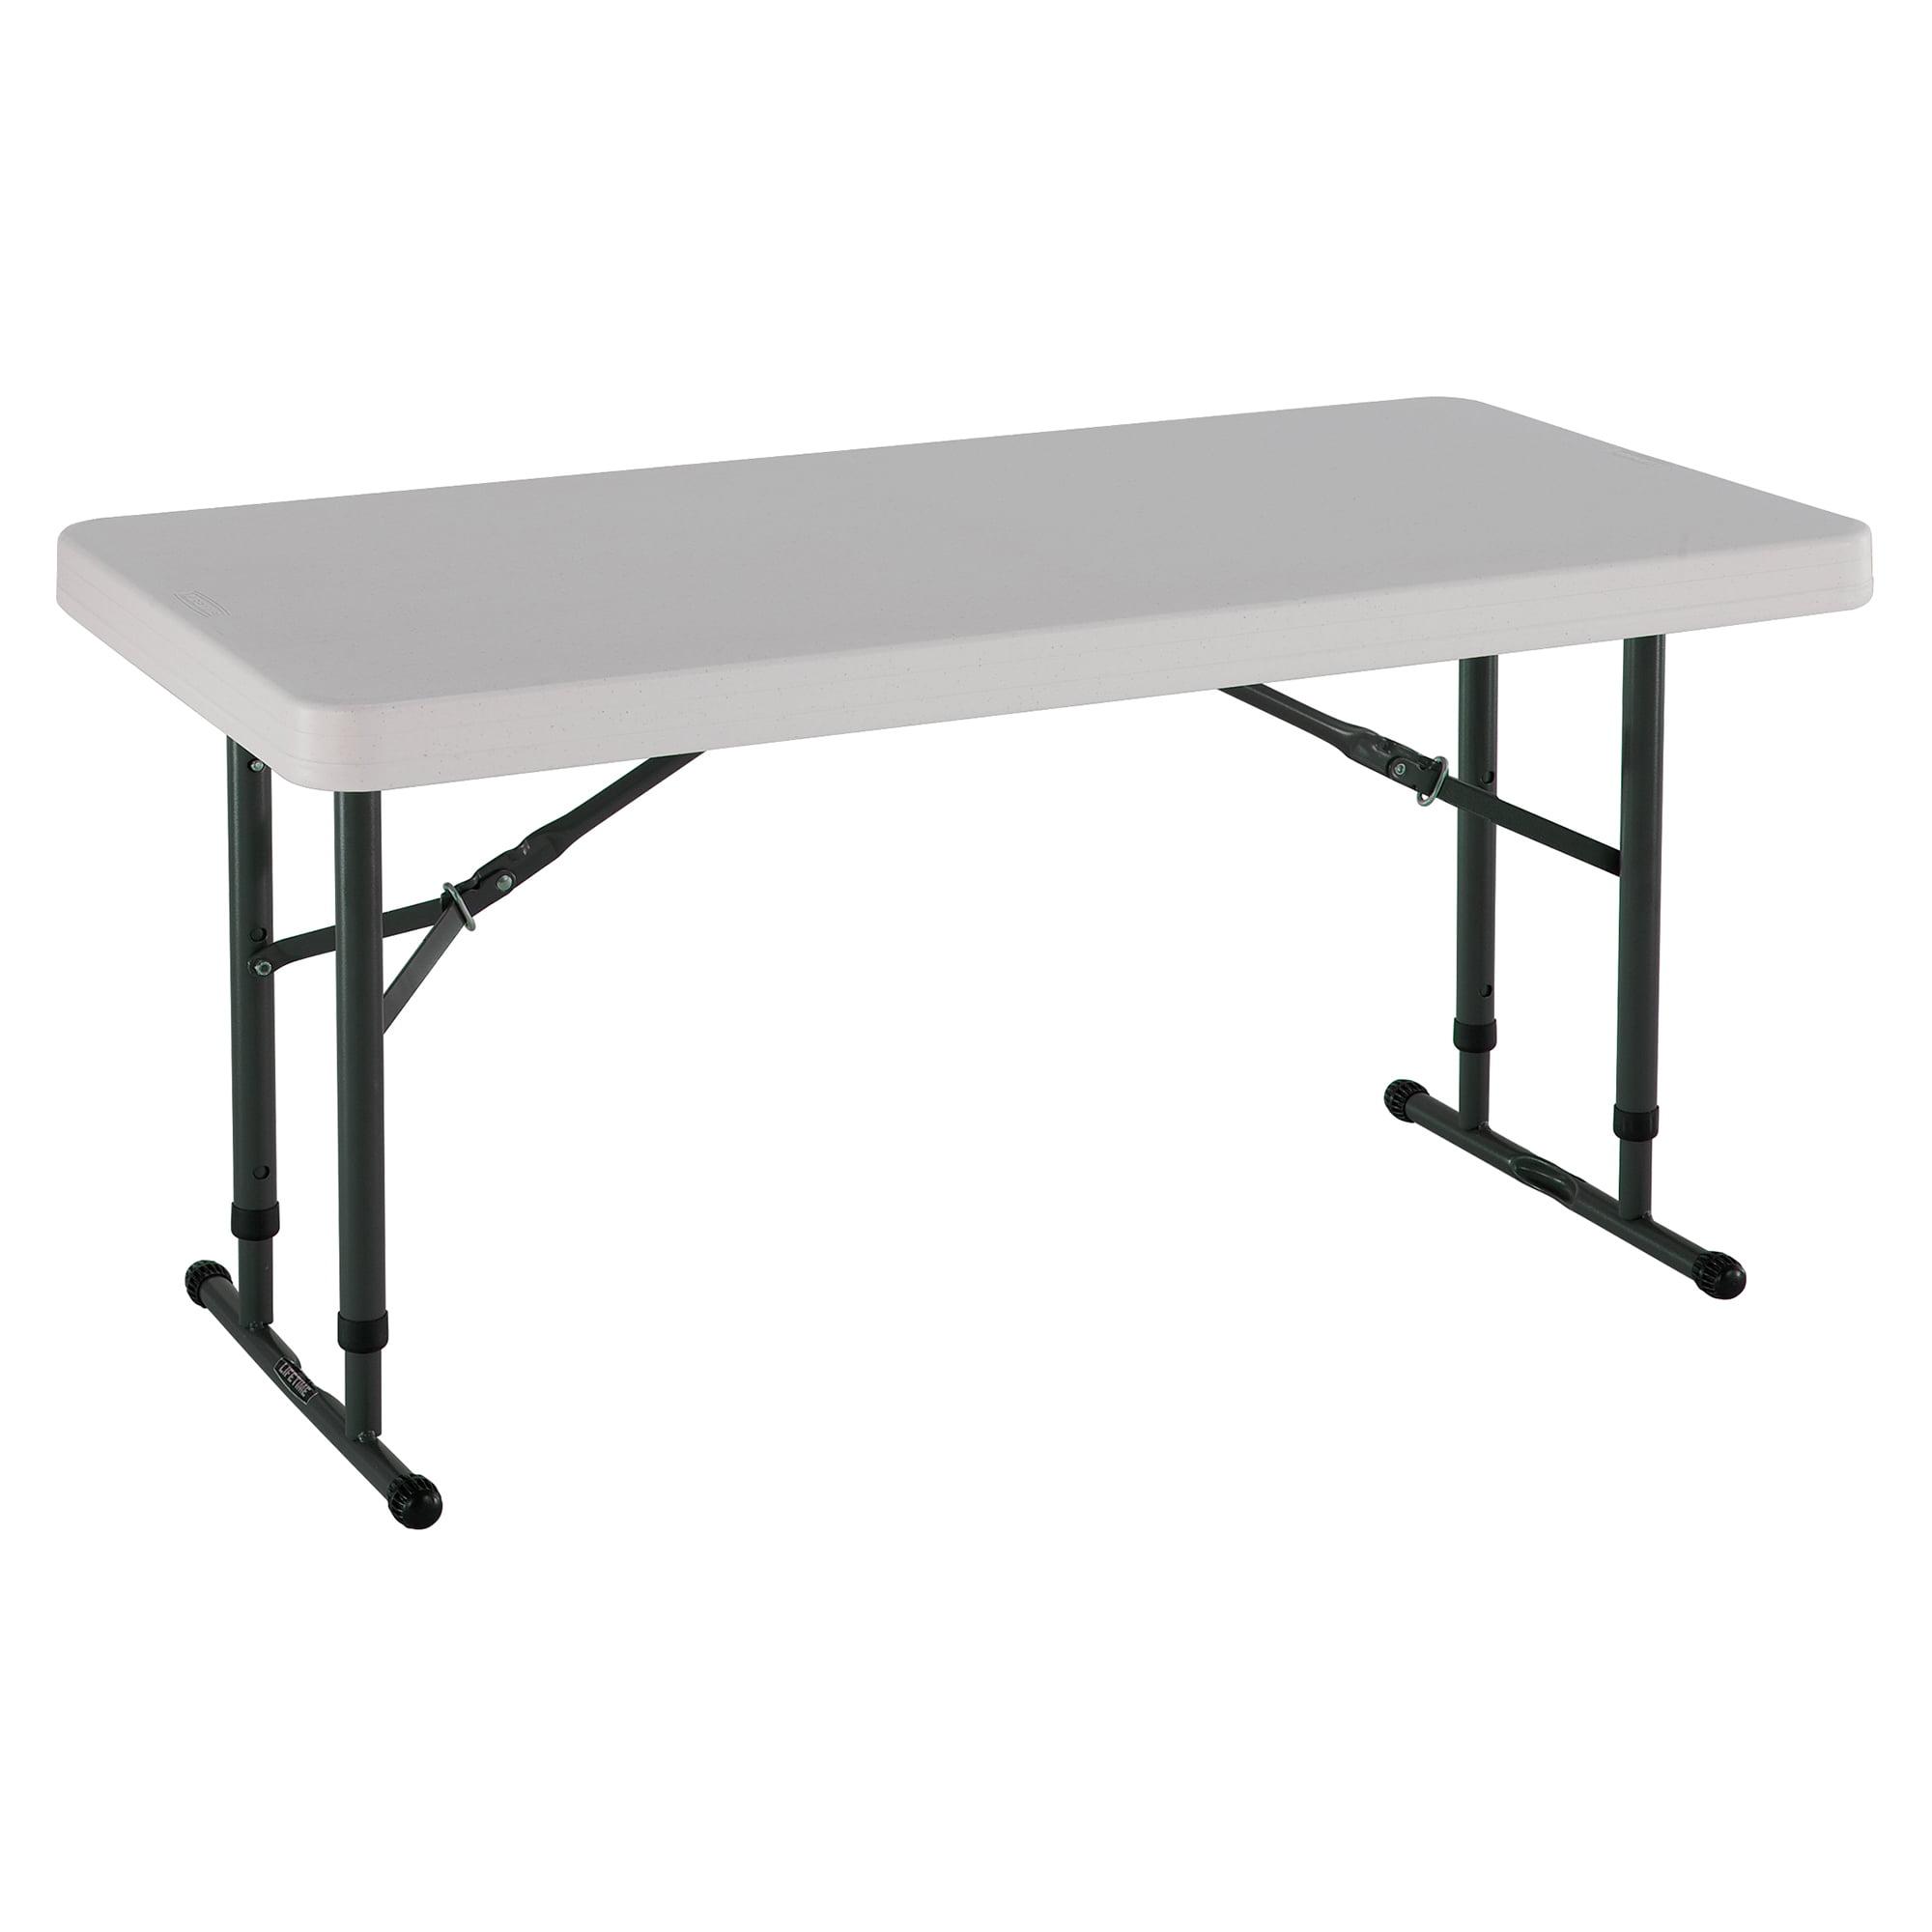 Almond Pack of 4 8 Feet Lifetime 42984 Folding Utility Table